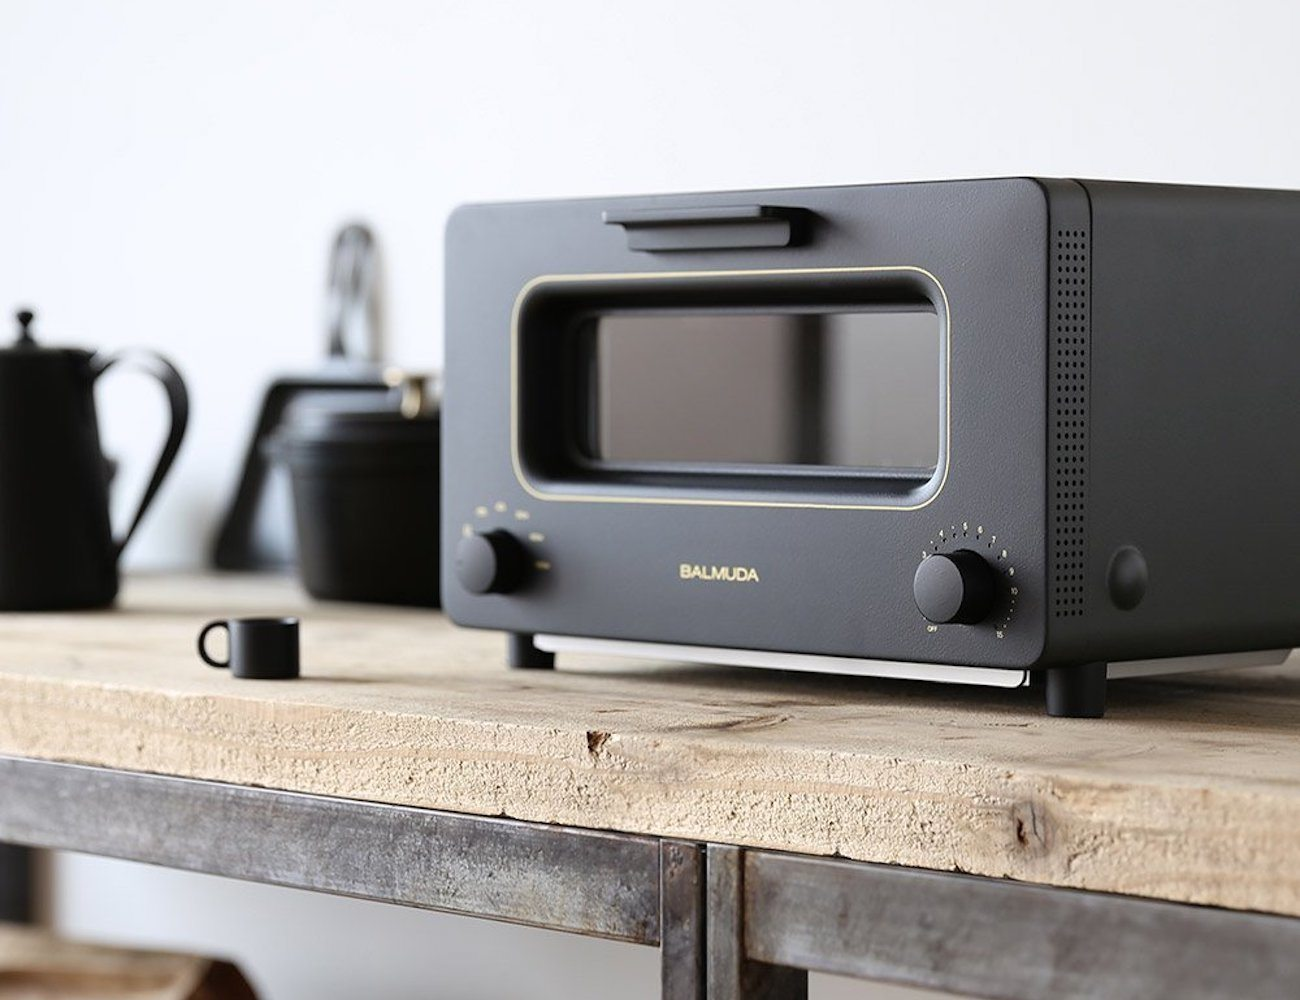 Balmuda+The+Toaster